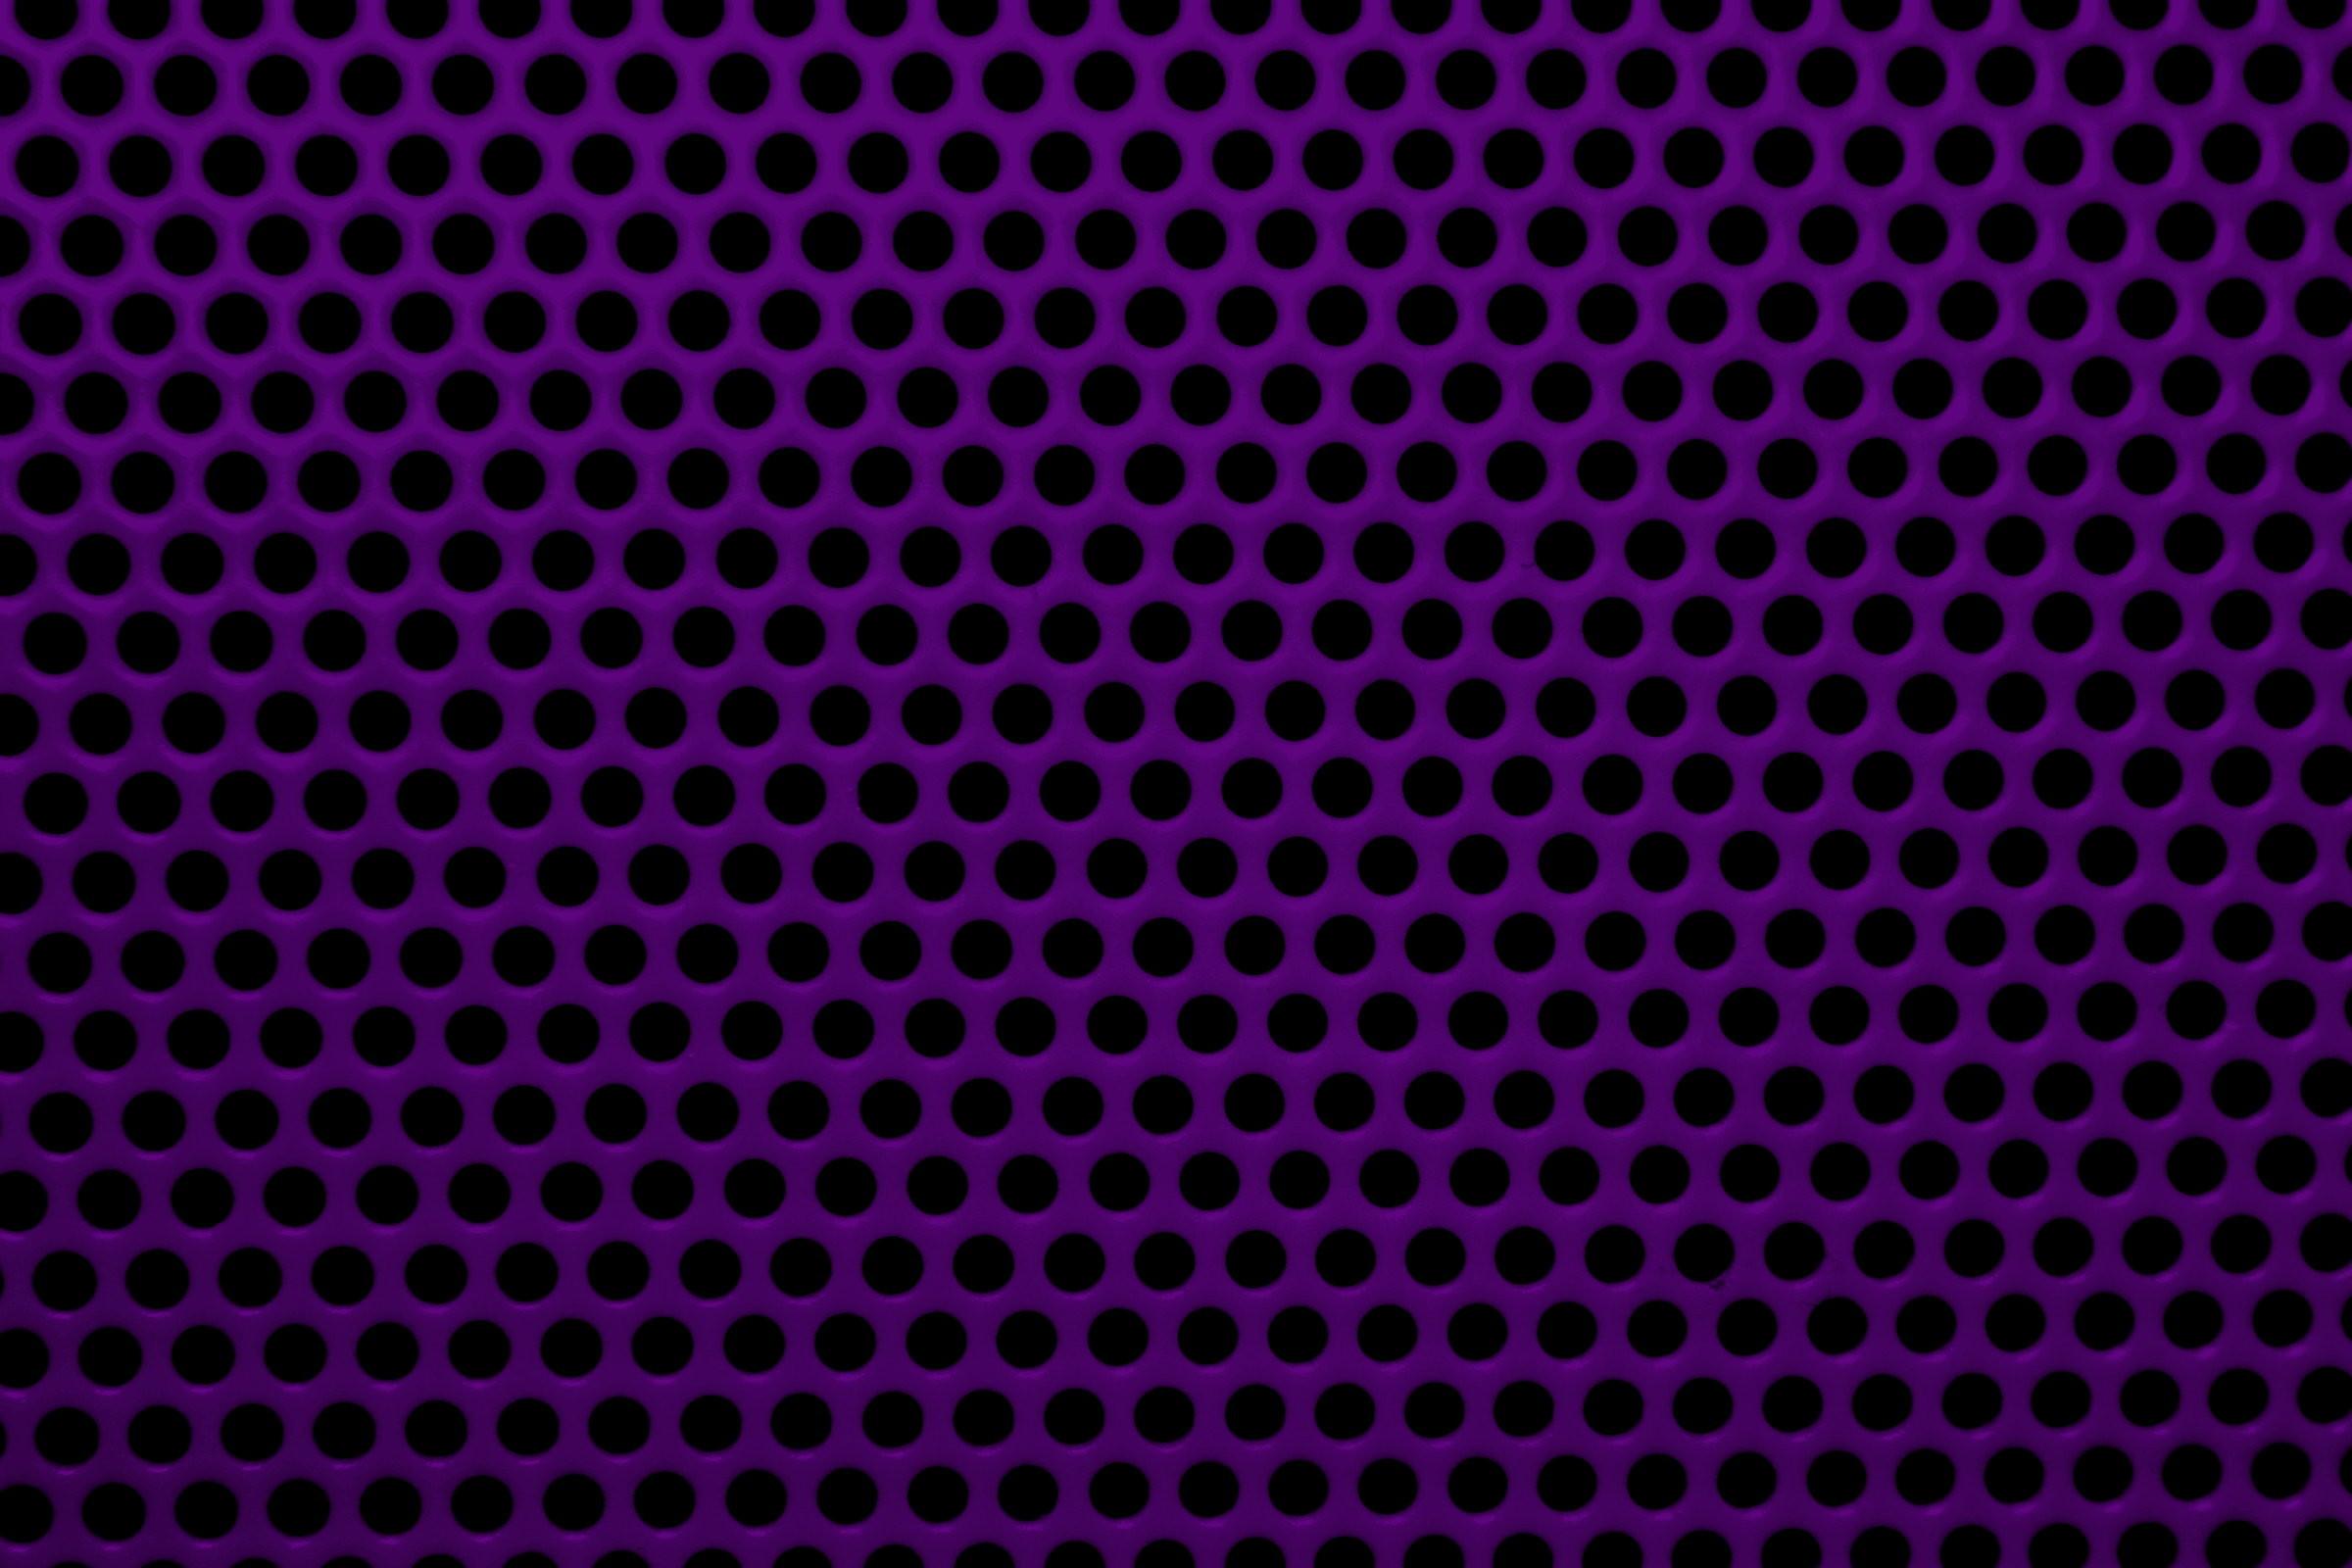 Dark Purple Metal Mesh with Round Holes Texture